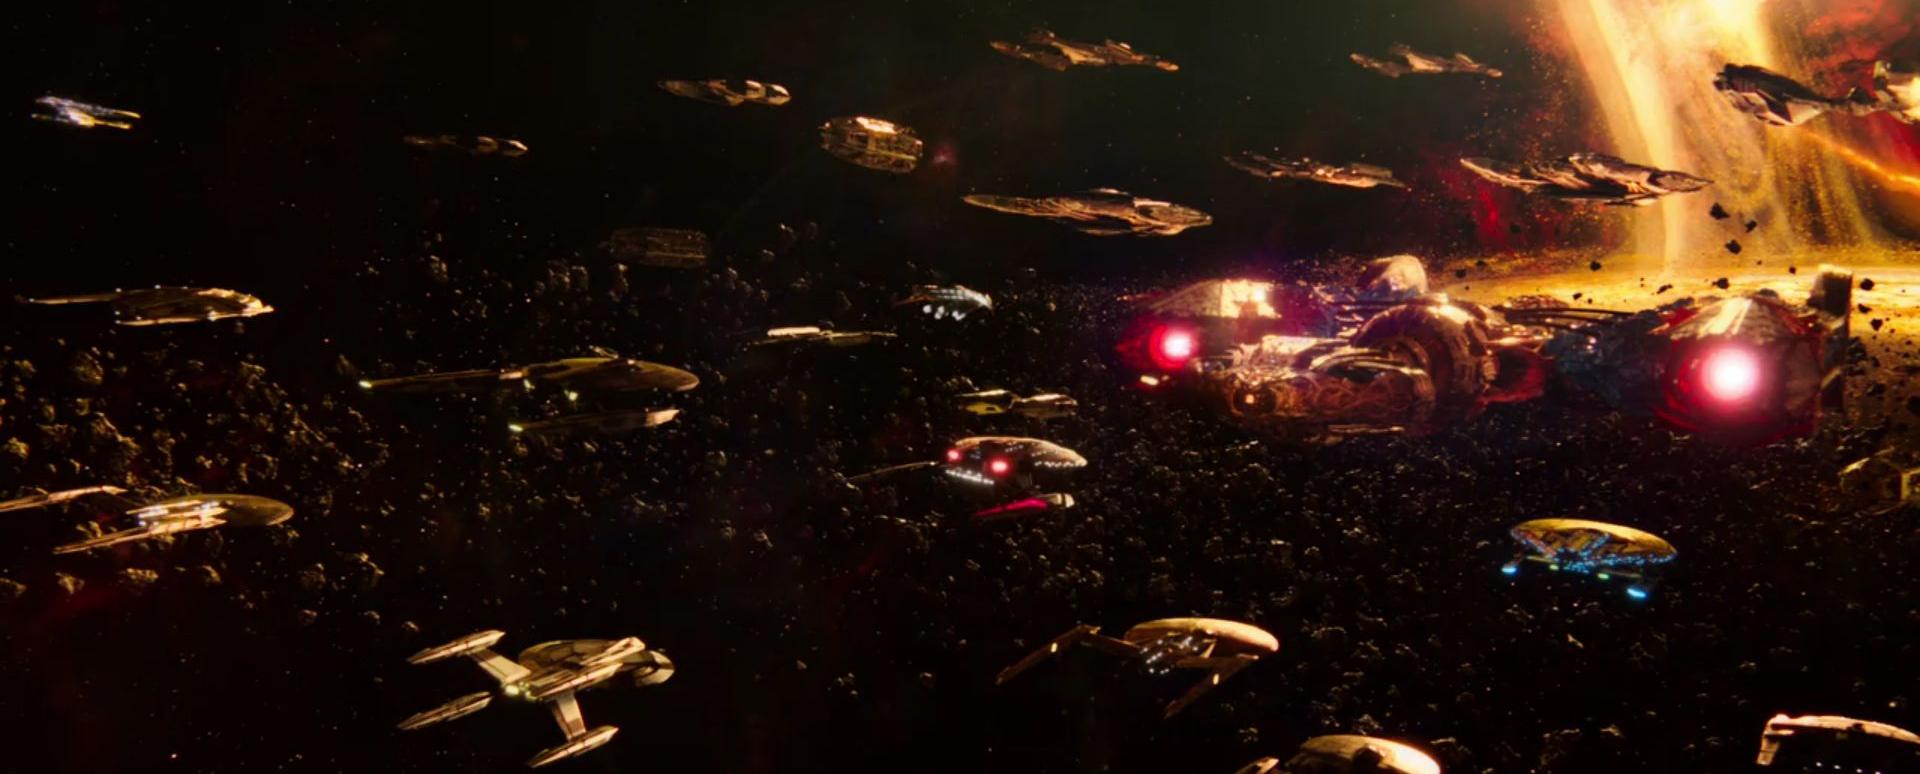 battle_of_the_binary_stars_fleets.jpg